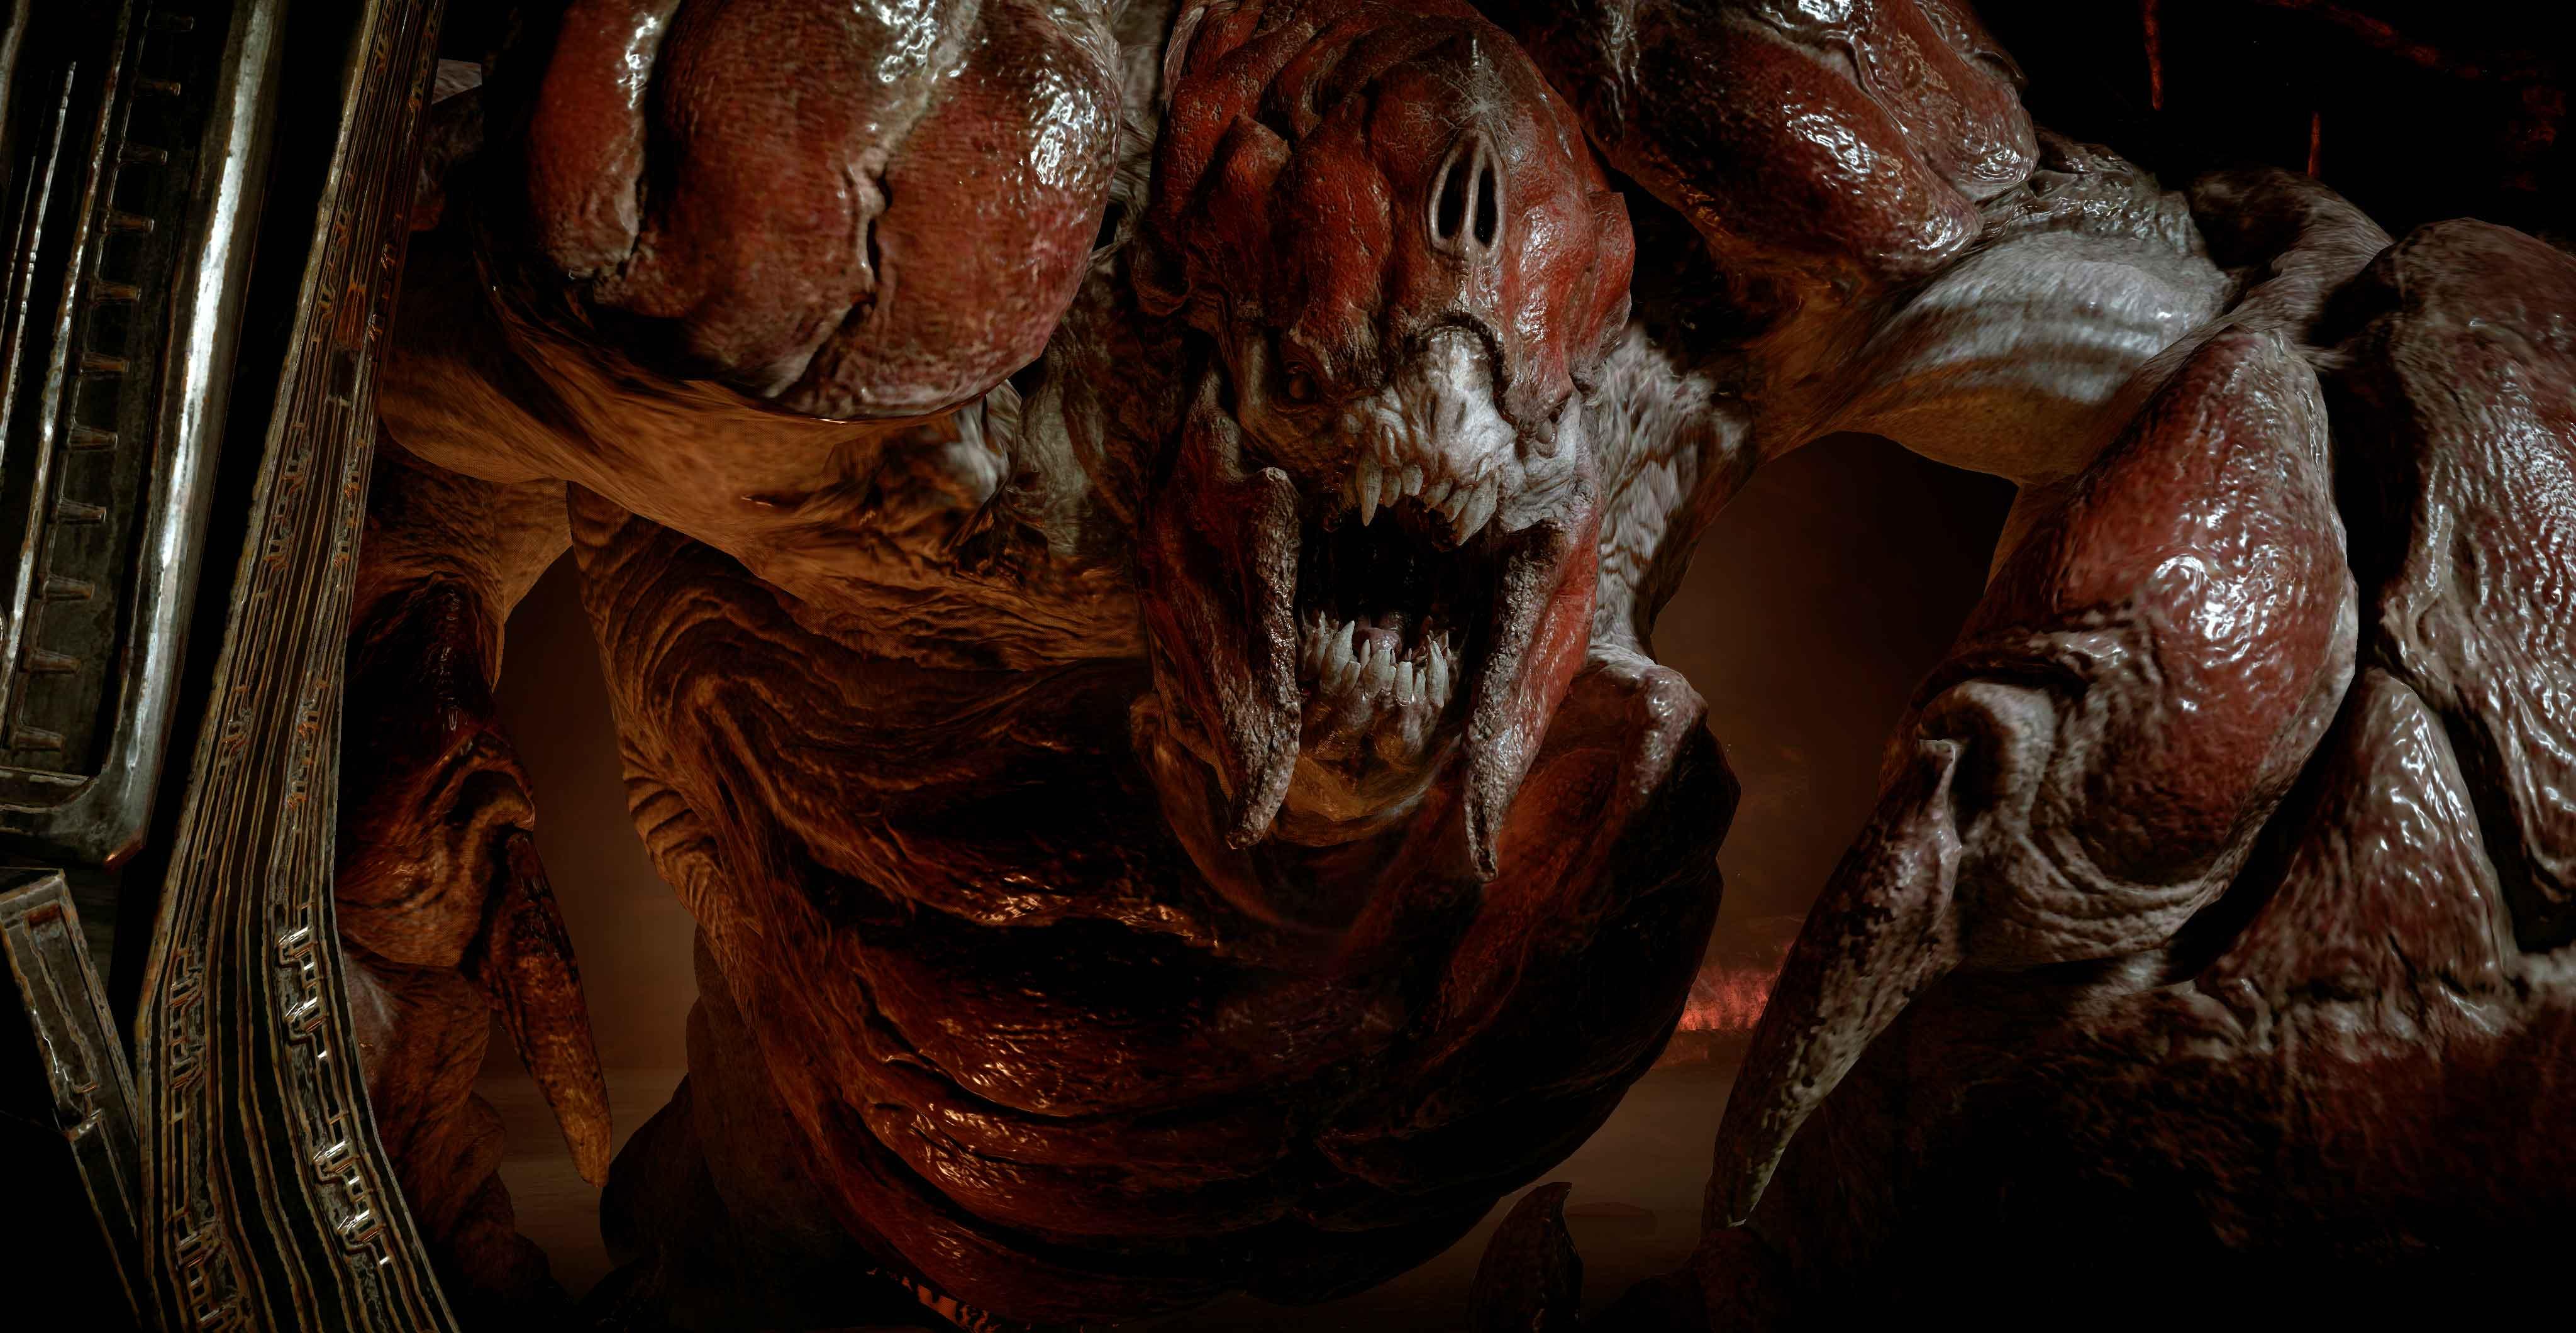 Gears of War 4 | Games | Gears of War - Official Site